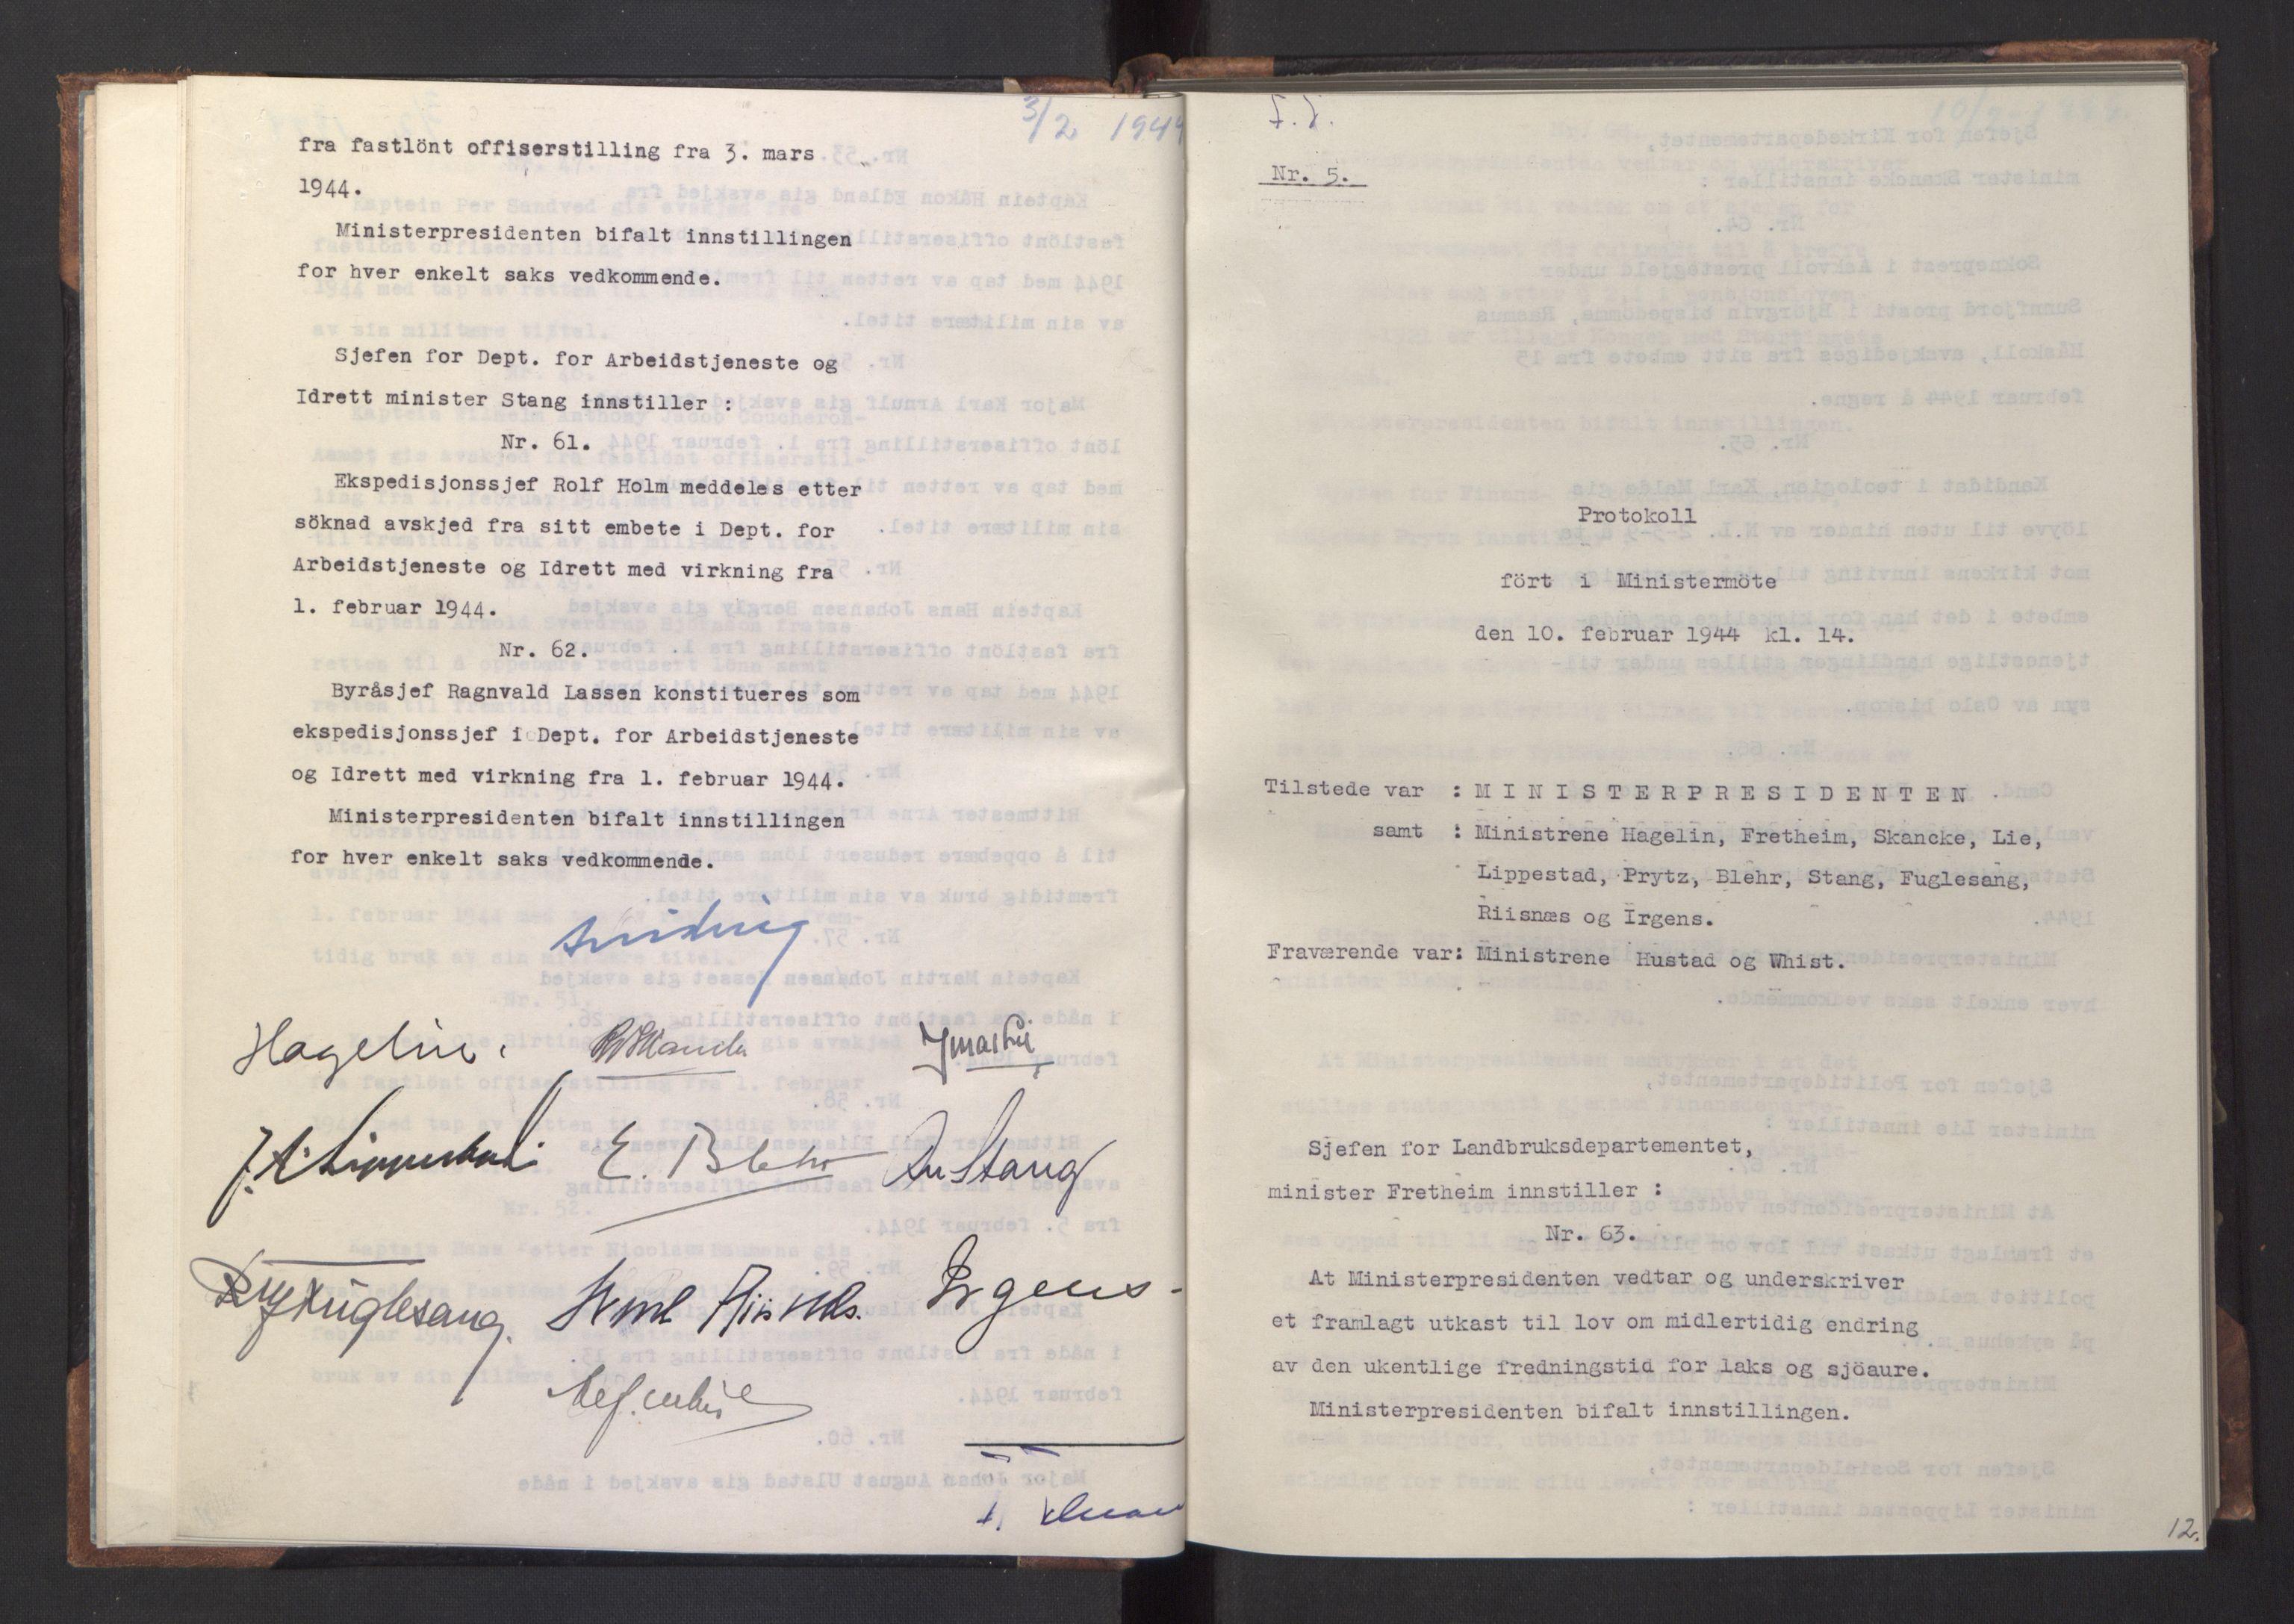 RA, NS-administrasjonen 1940-1945 (Statsrådsekretariatet, de kommisariske statsråder mm), D/Da/L0005: Protokoll fra ministermøter, 1944, s. 11b-12a